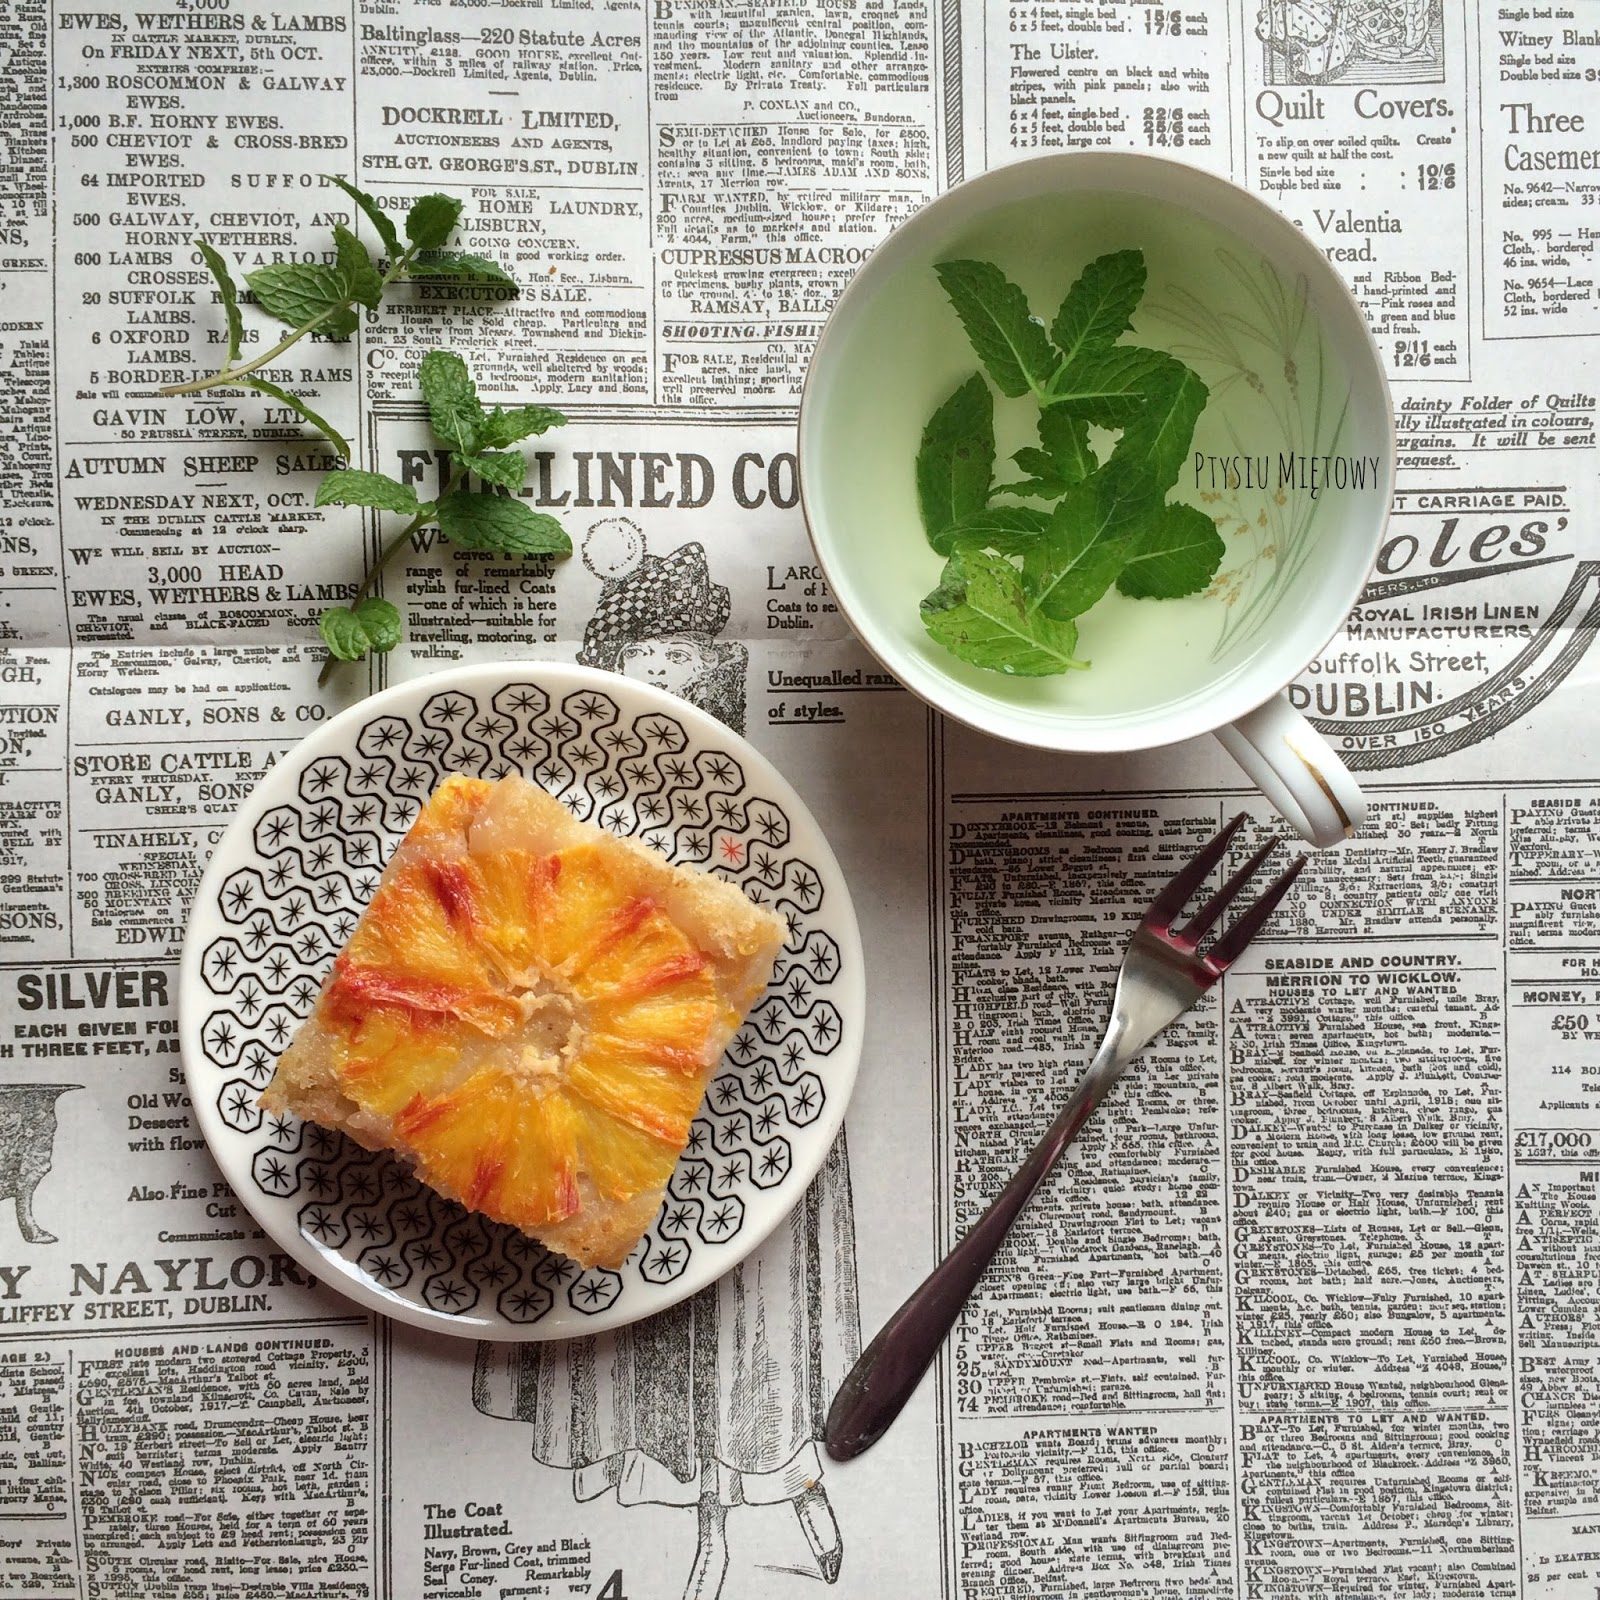 ciasto, ptysiu mietowy